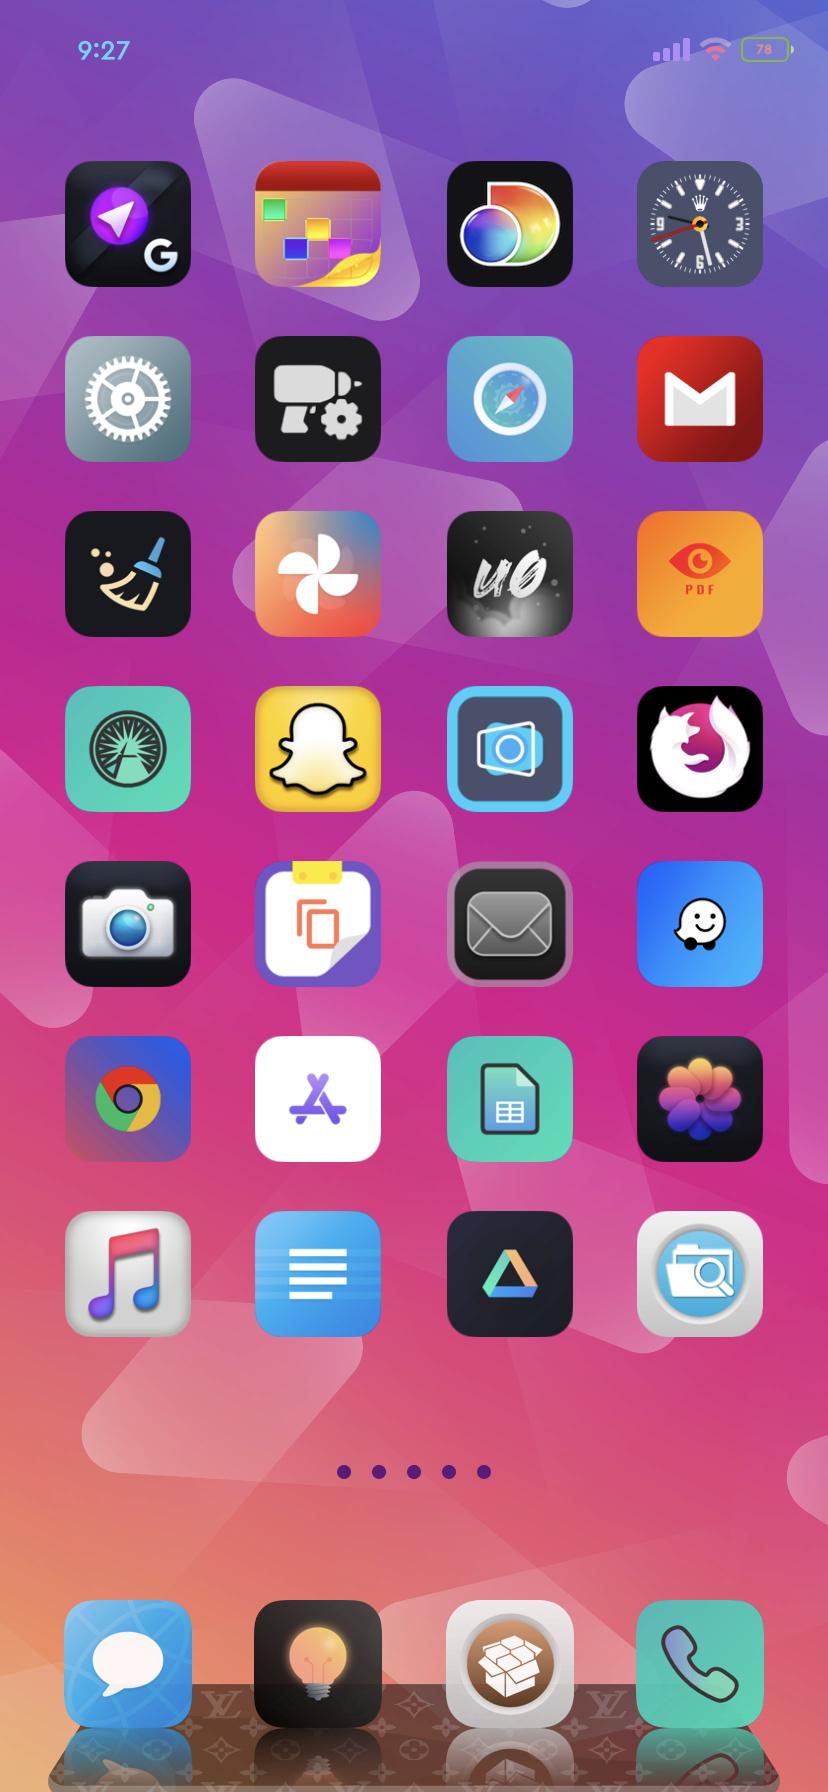 [THEME] Trippy Homescreen (Light Mode) iOS 14.0.1  681d1f10